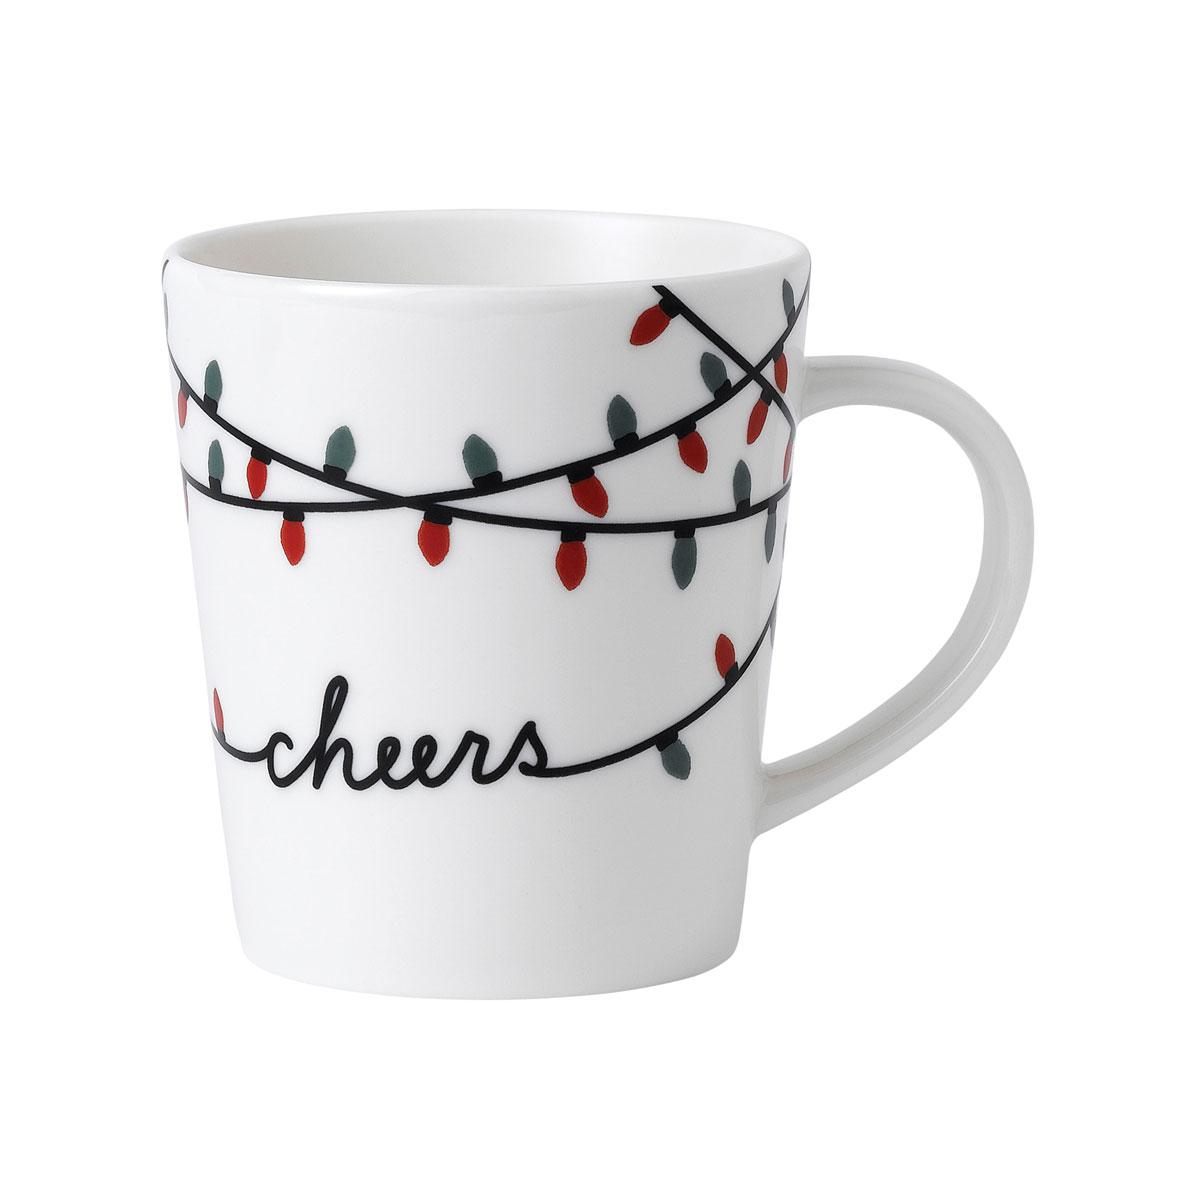 ED Ellen DeGeneres By Royal Doulton Christmas Cheers Mug